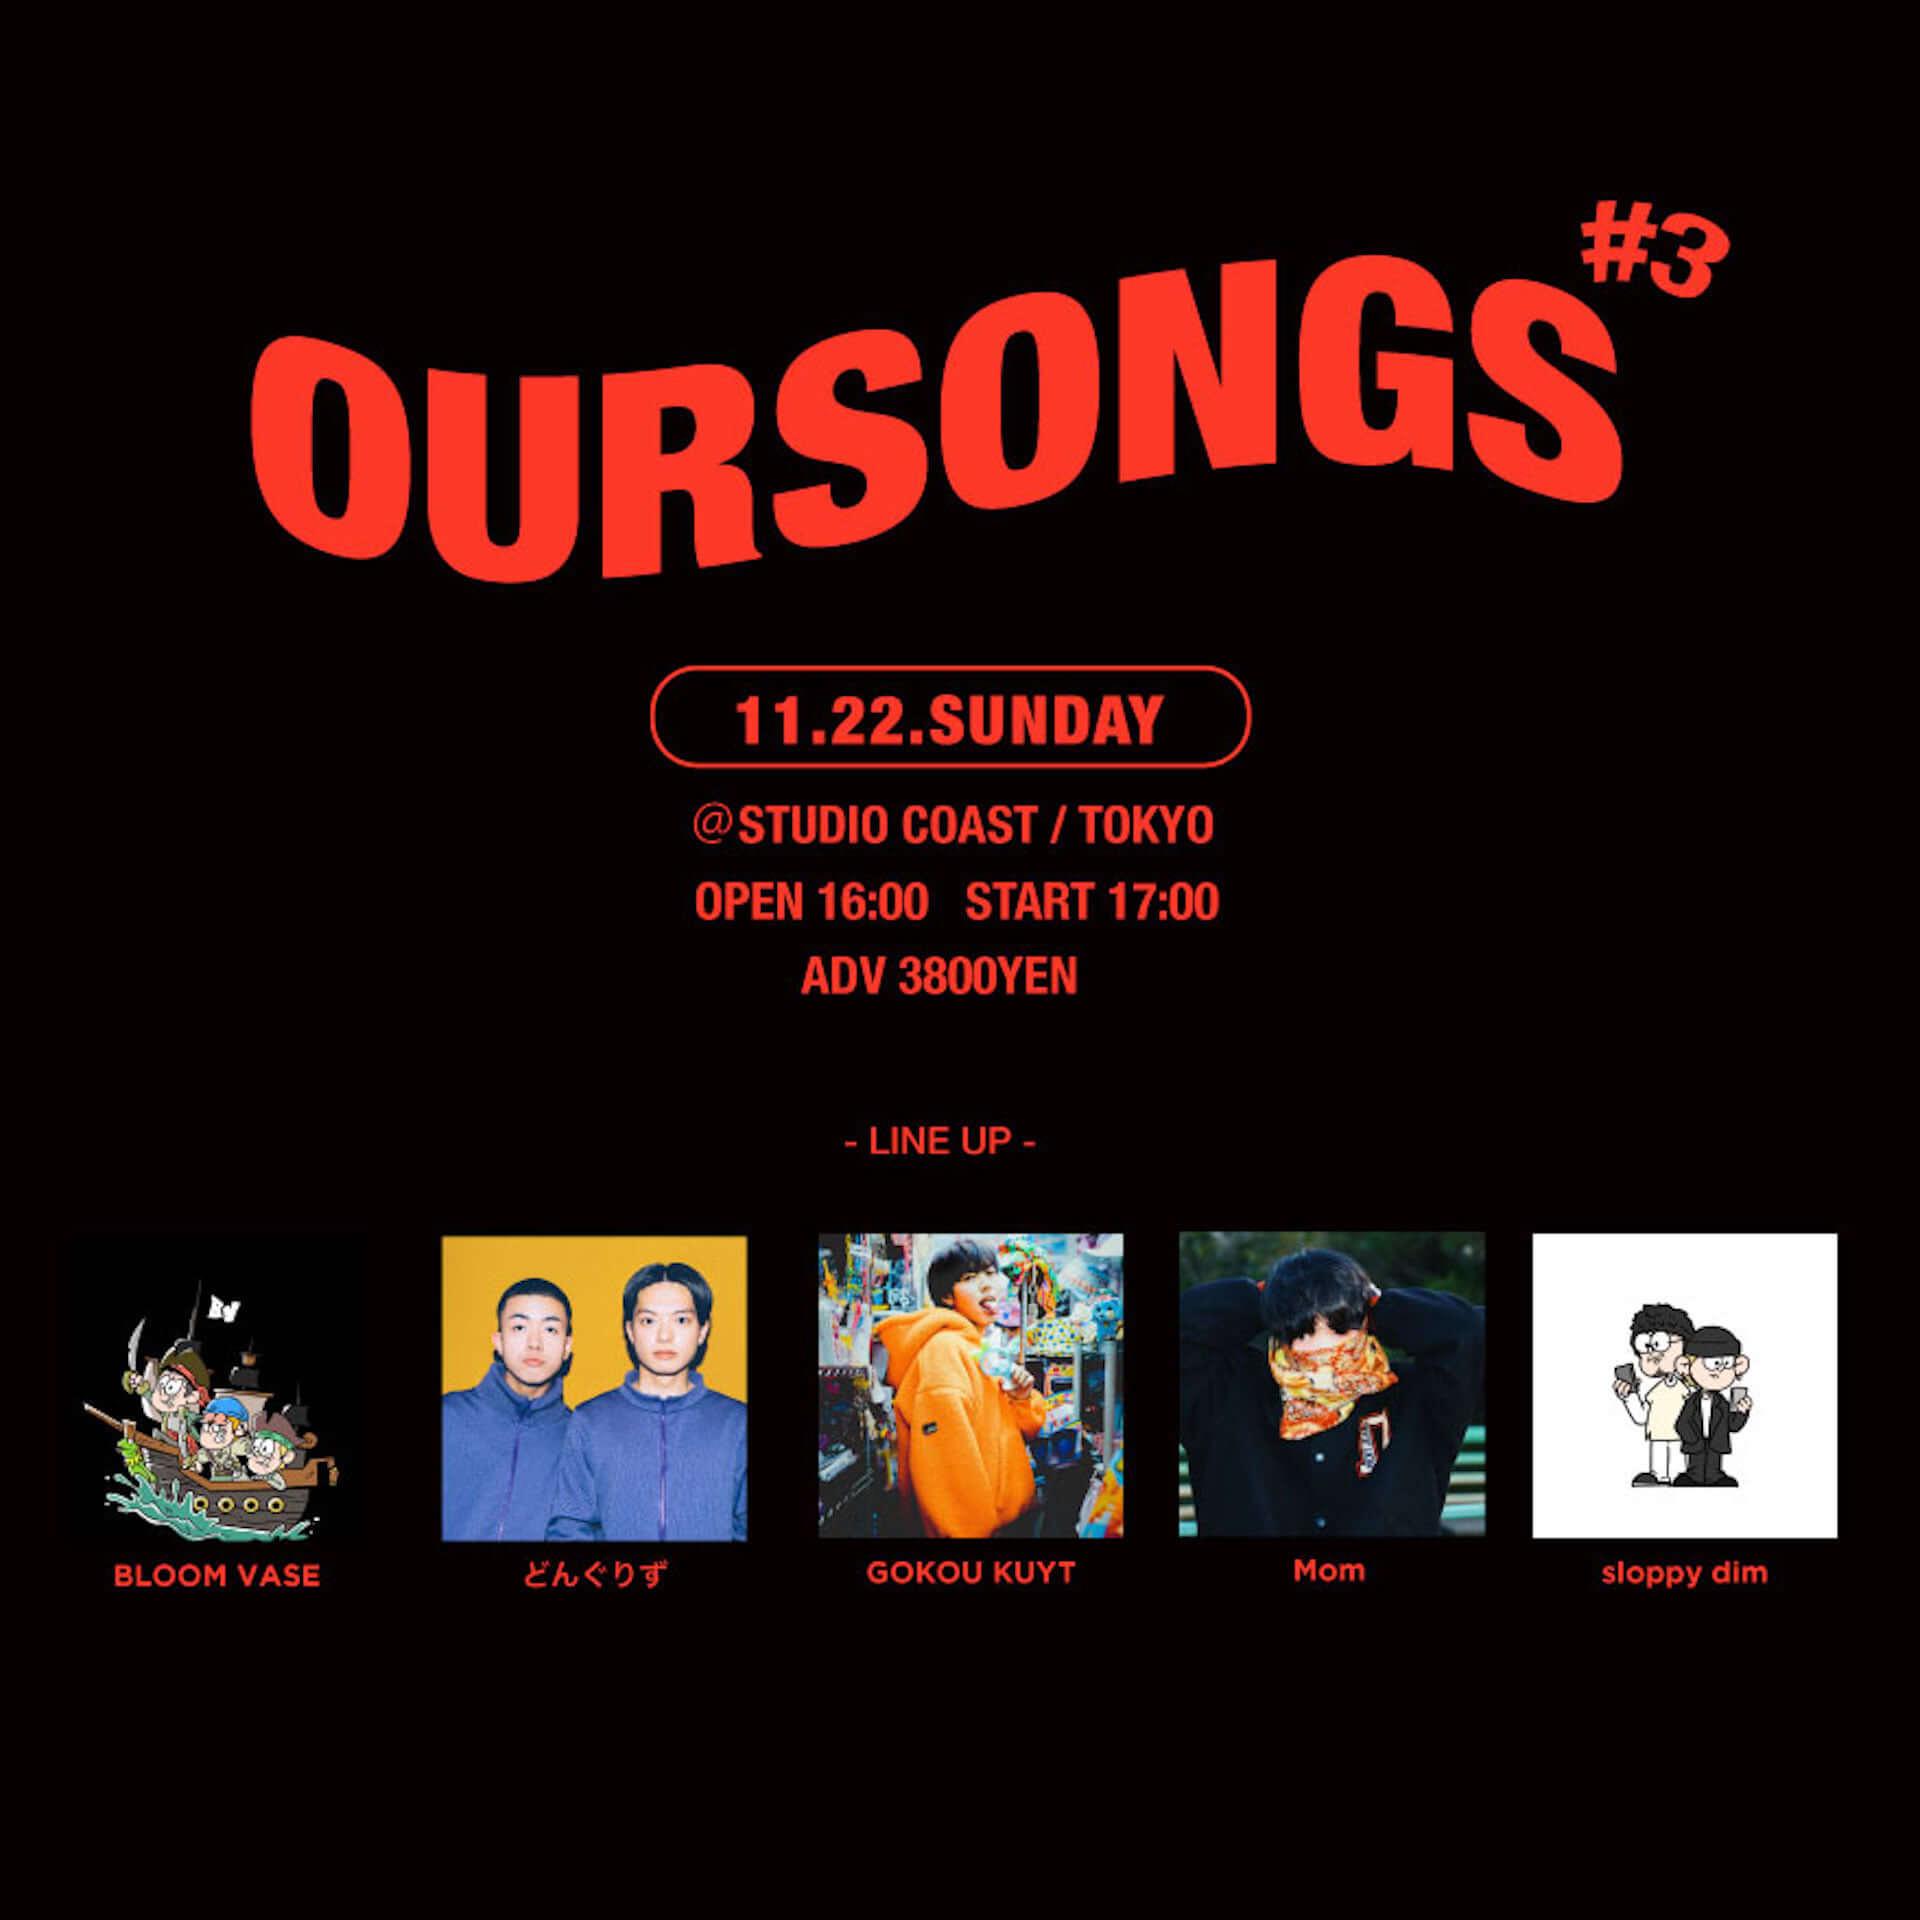 CIRCUS主催<OURSONGS #3>が新木場STUDIO COASTにて開催決定!Mom、GOKOU KUYT、sloppy dim、BLOOM VASE、どんぐりずが出演 music201022_oursongs_4-1920x1920